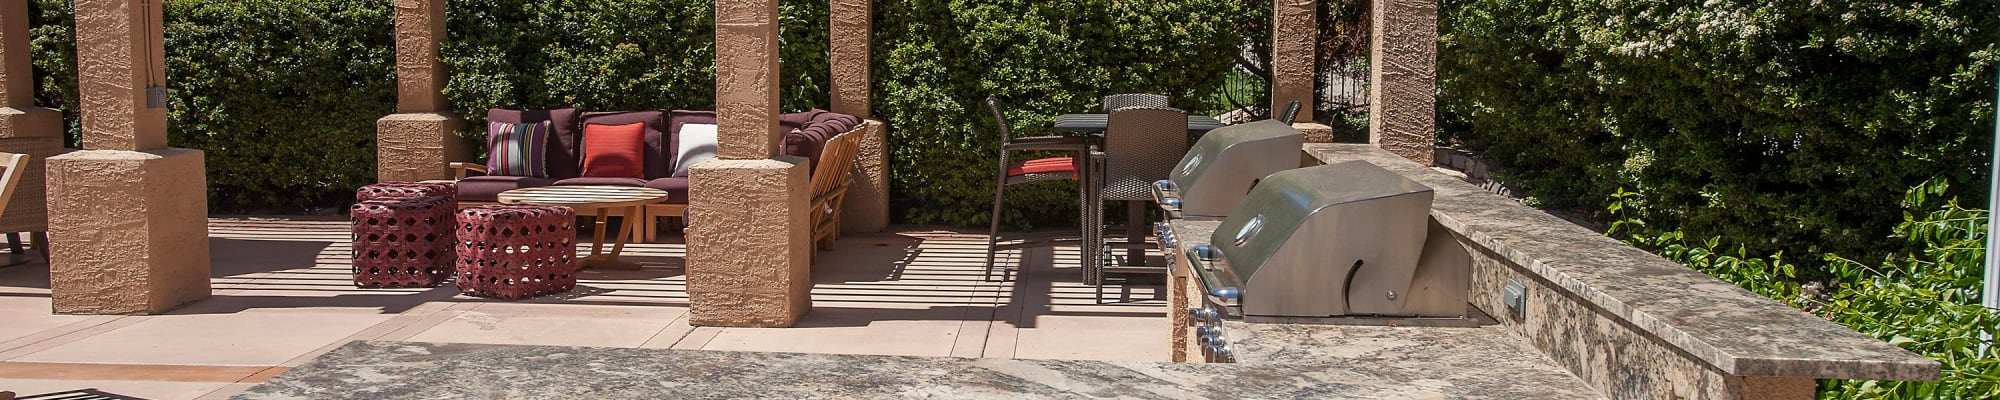 Reviews of The Vintage at South Meadows Condominium Rentals in Reno, Nevada